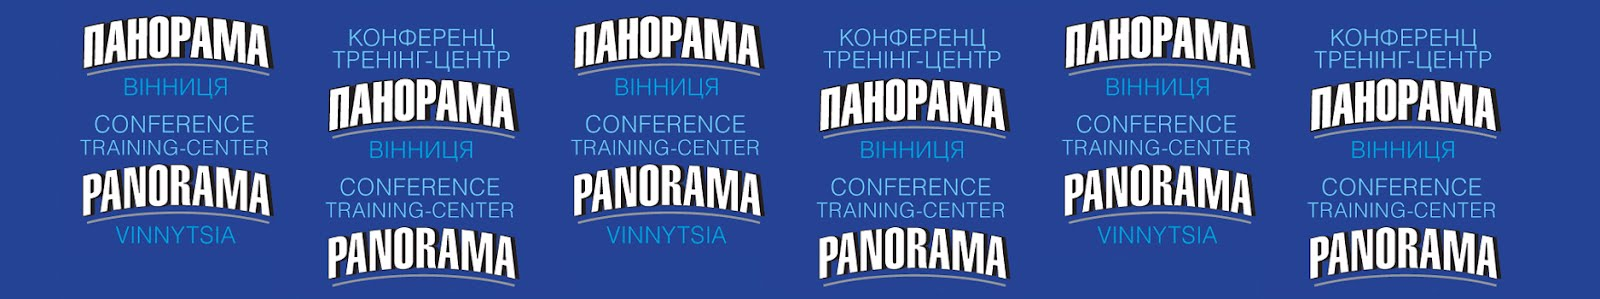 "Конференц&тренинг-центр ""Панорама"""